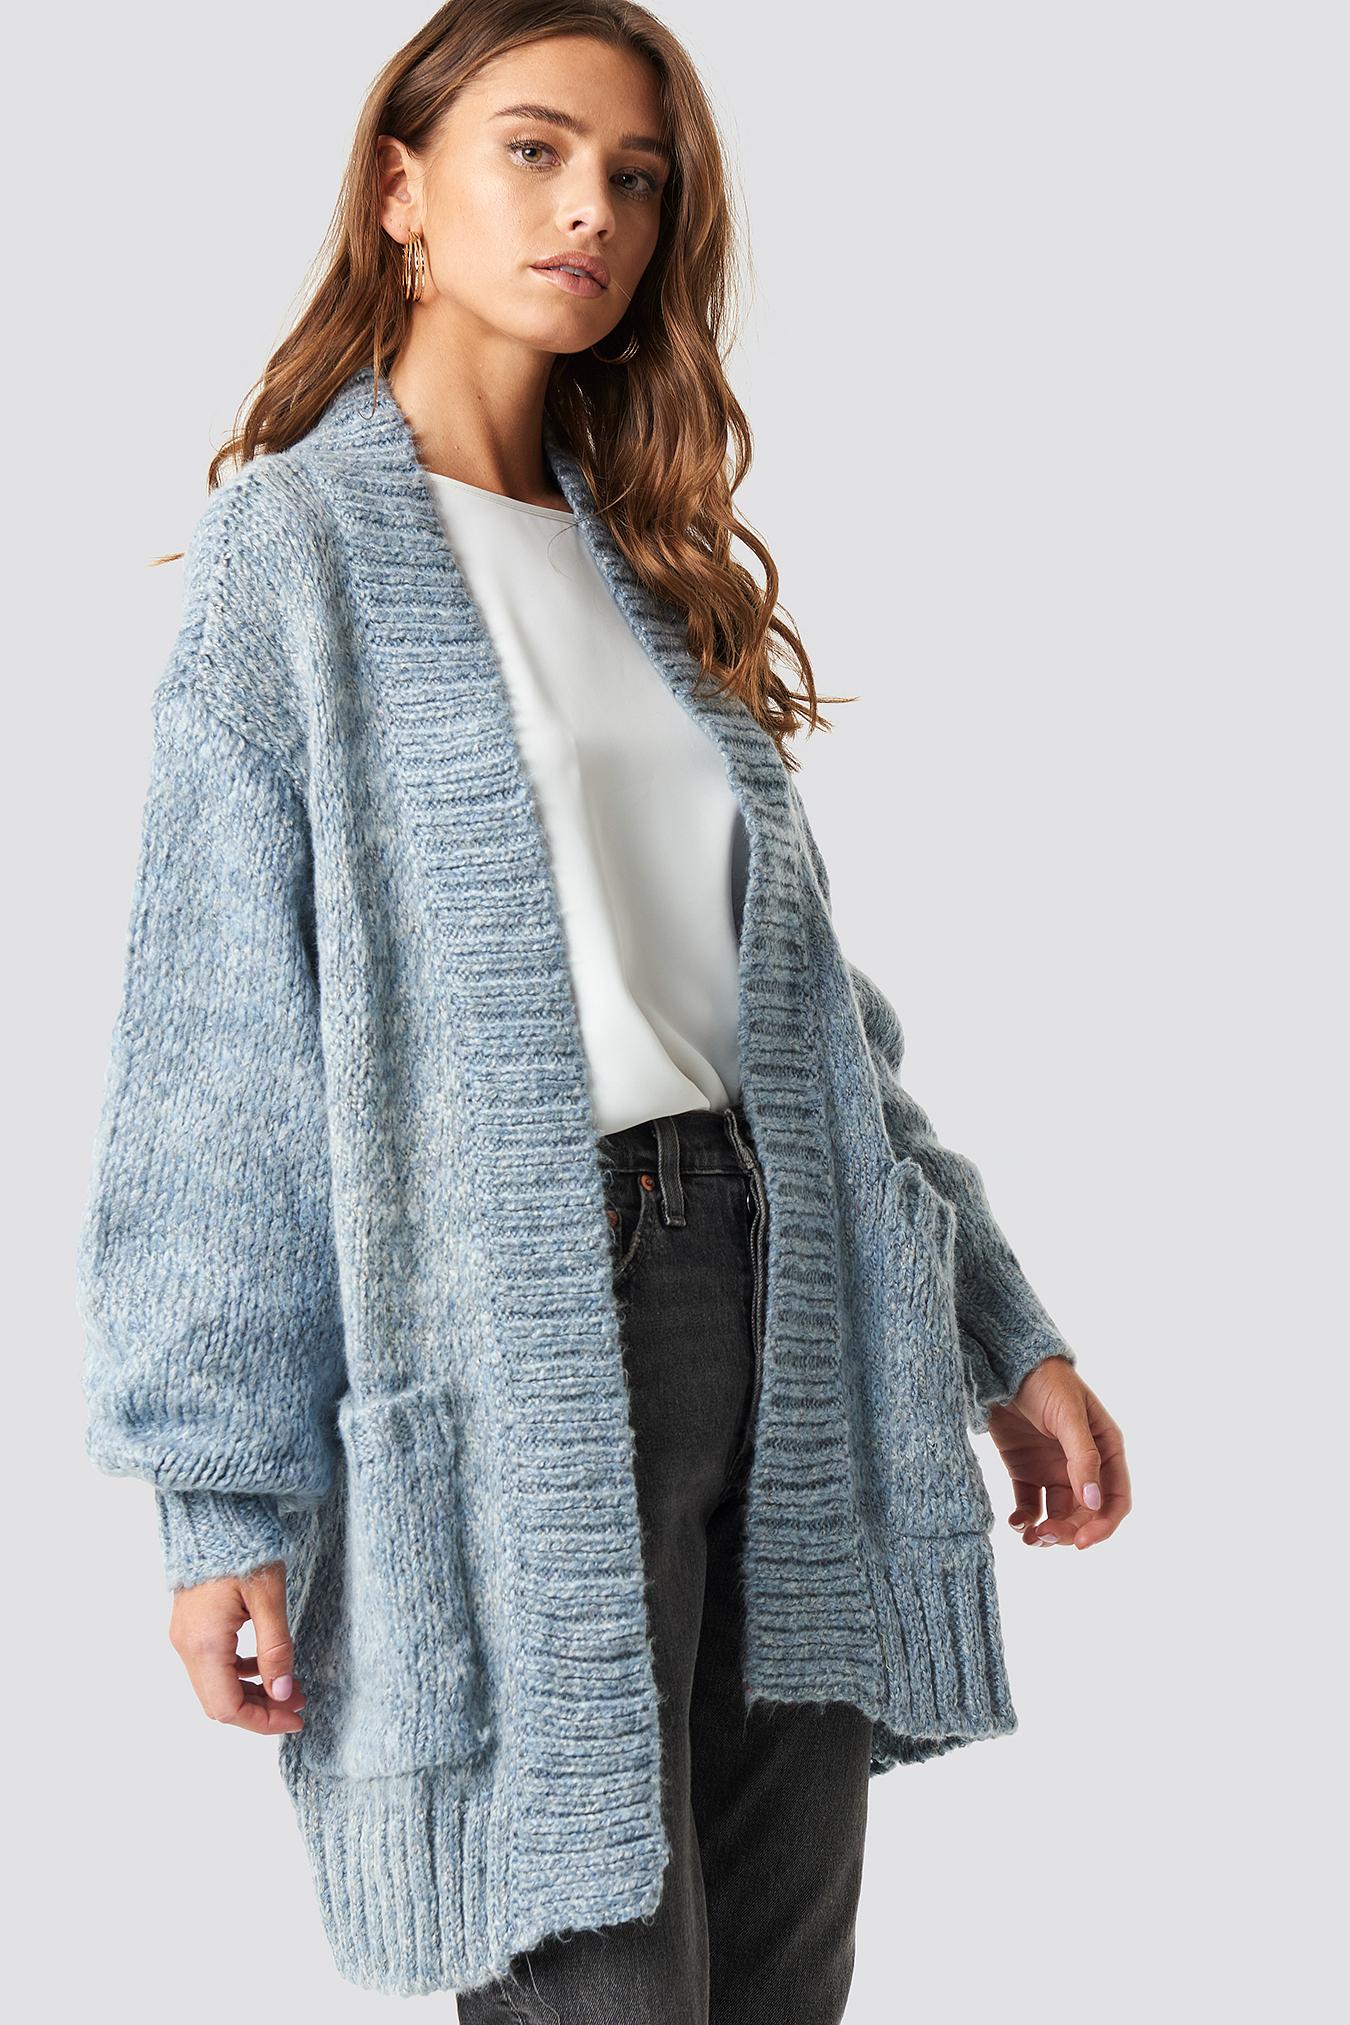 TRENDYOL Balloon Sleeve Sweater Cardigan - Blue